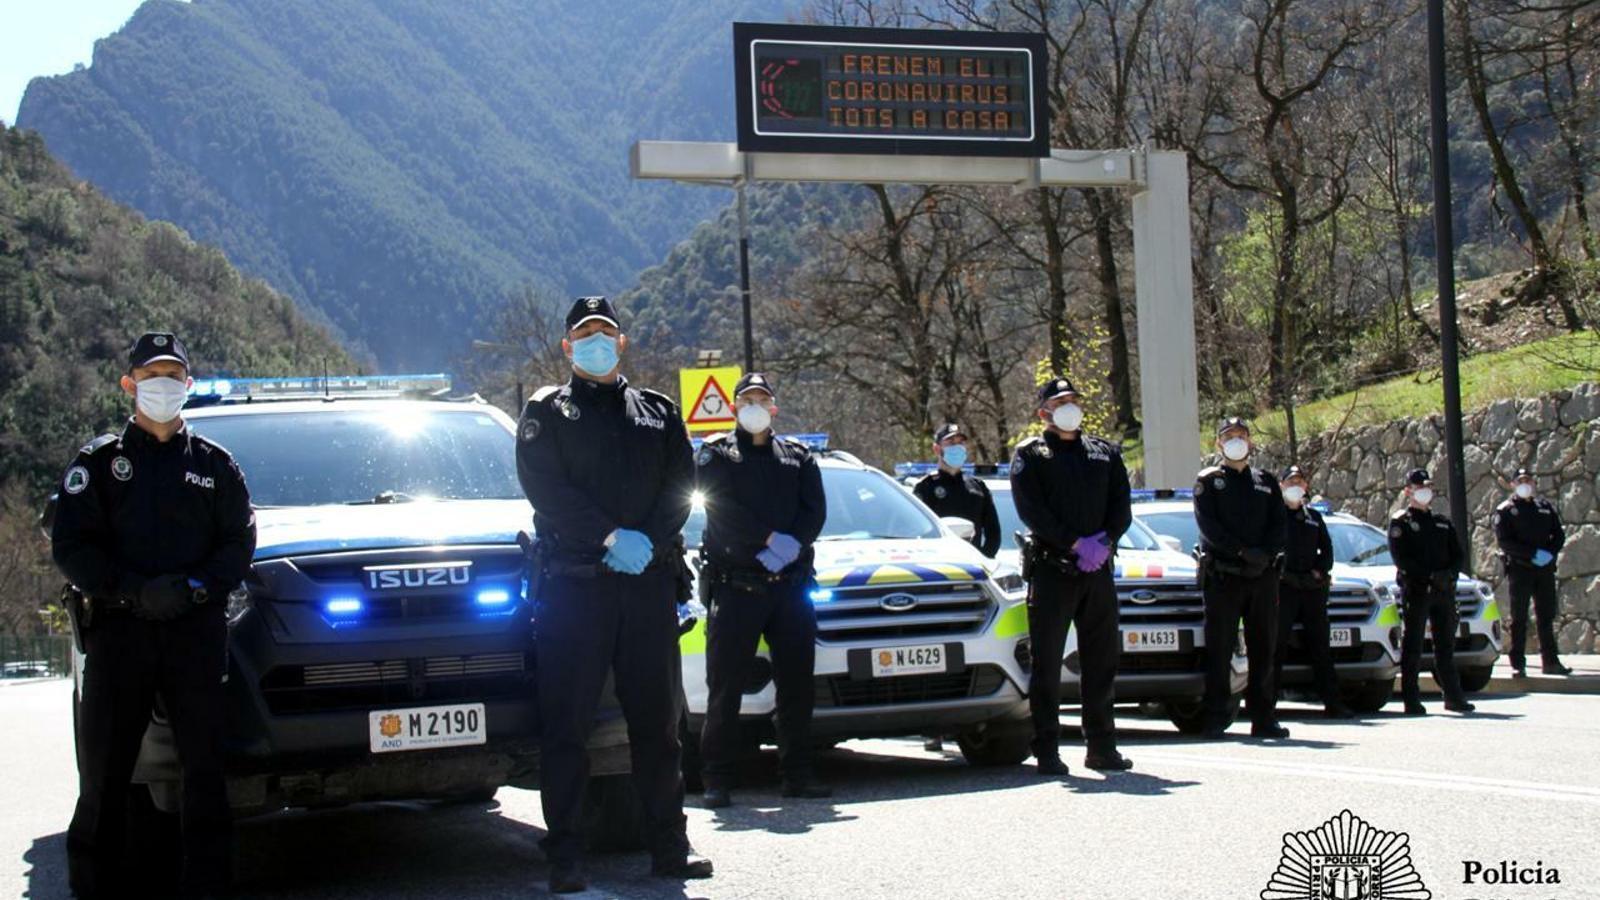 Efectius policials, aquest dissabte. / POLICIA D'ANDORRA